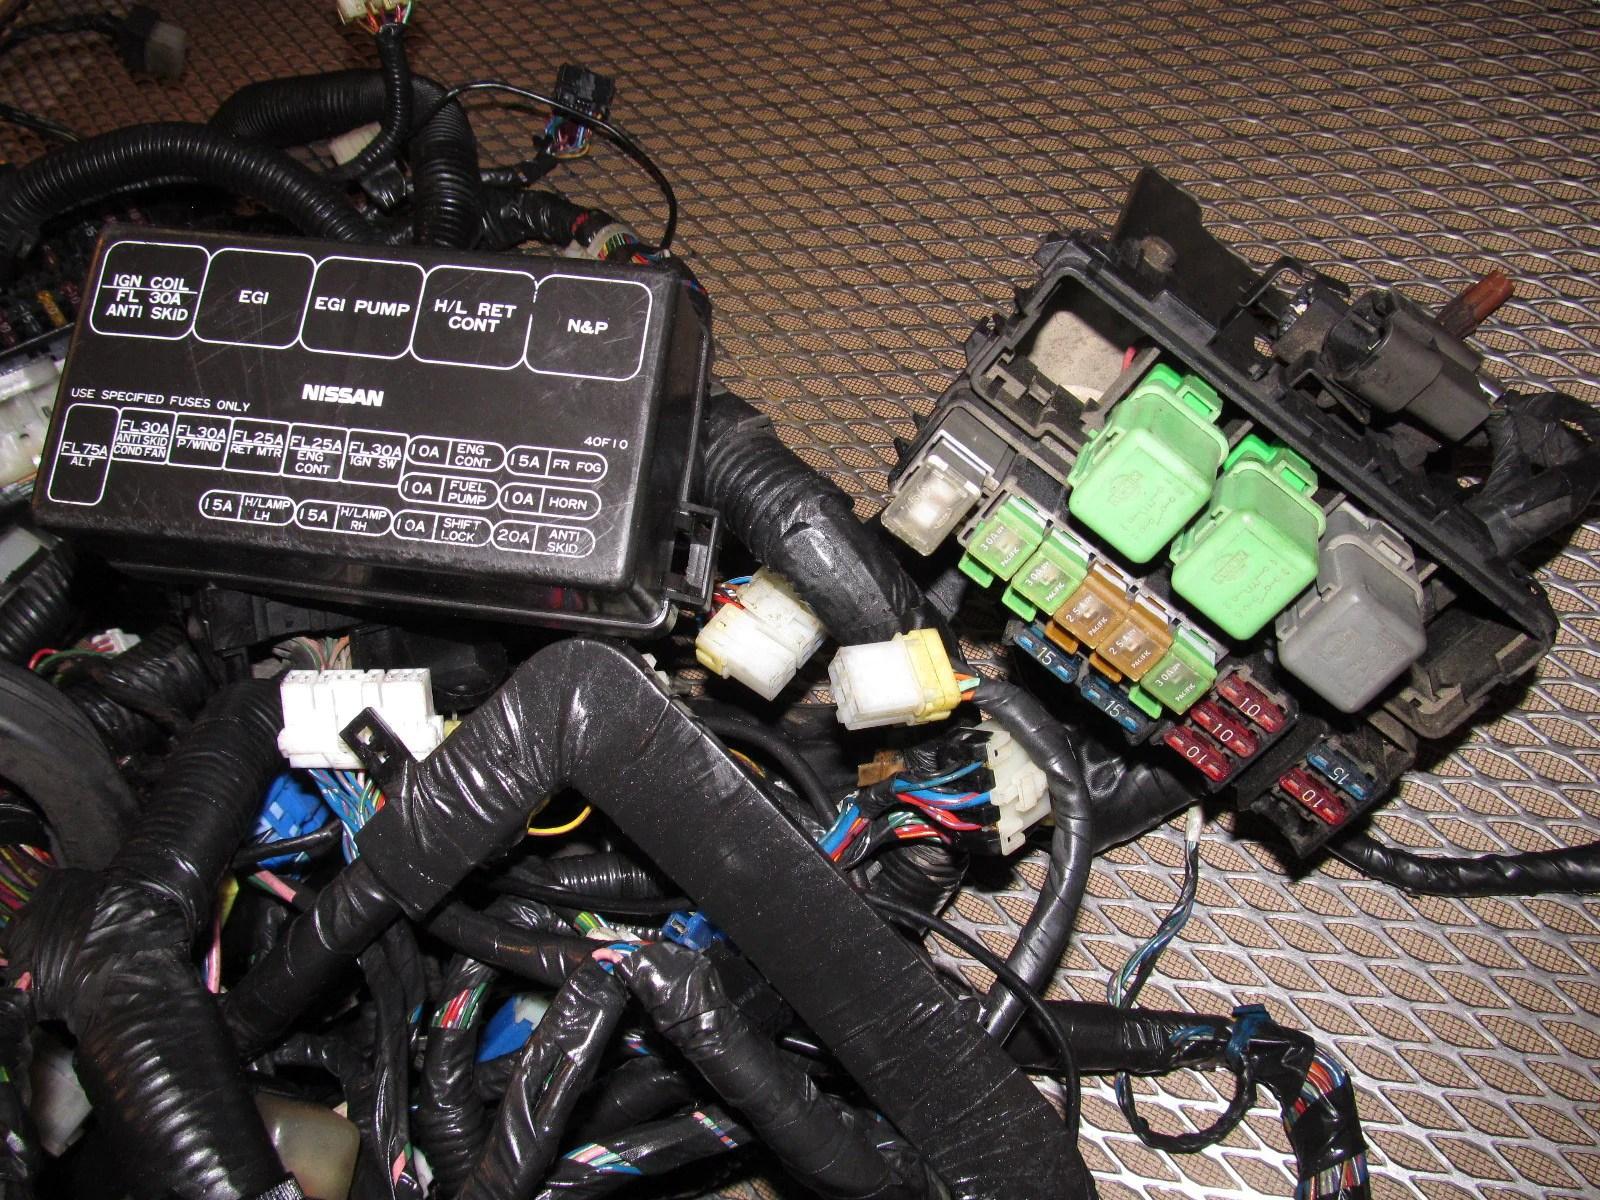 nissan 240sx fuse box wiring diagrams posts 1996 nissan 240sx fuse box [ 1600 x 1200 Pixel ]